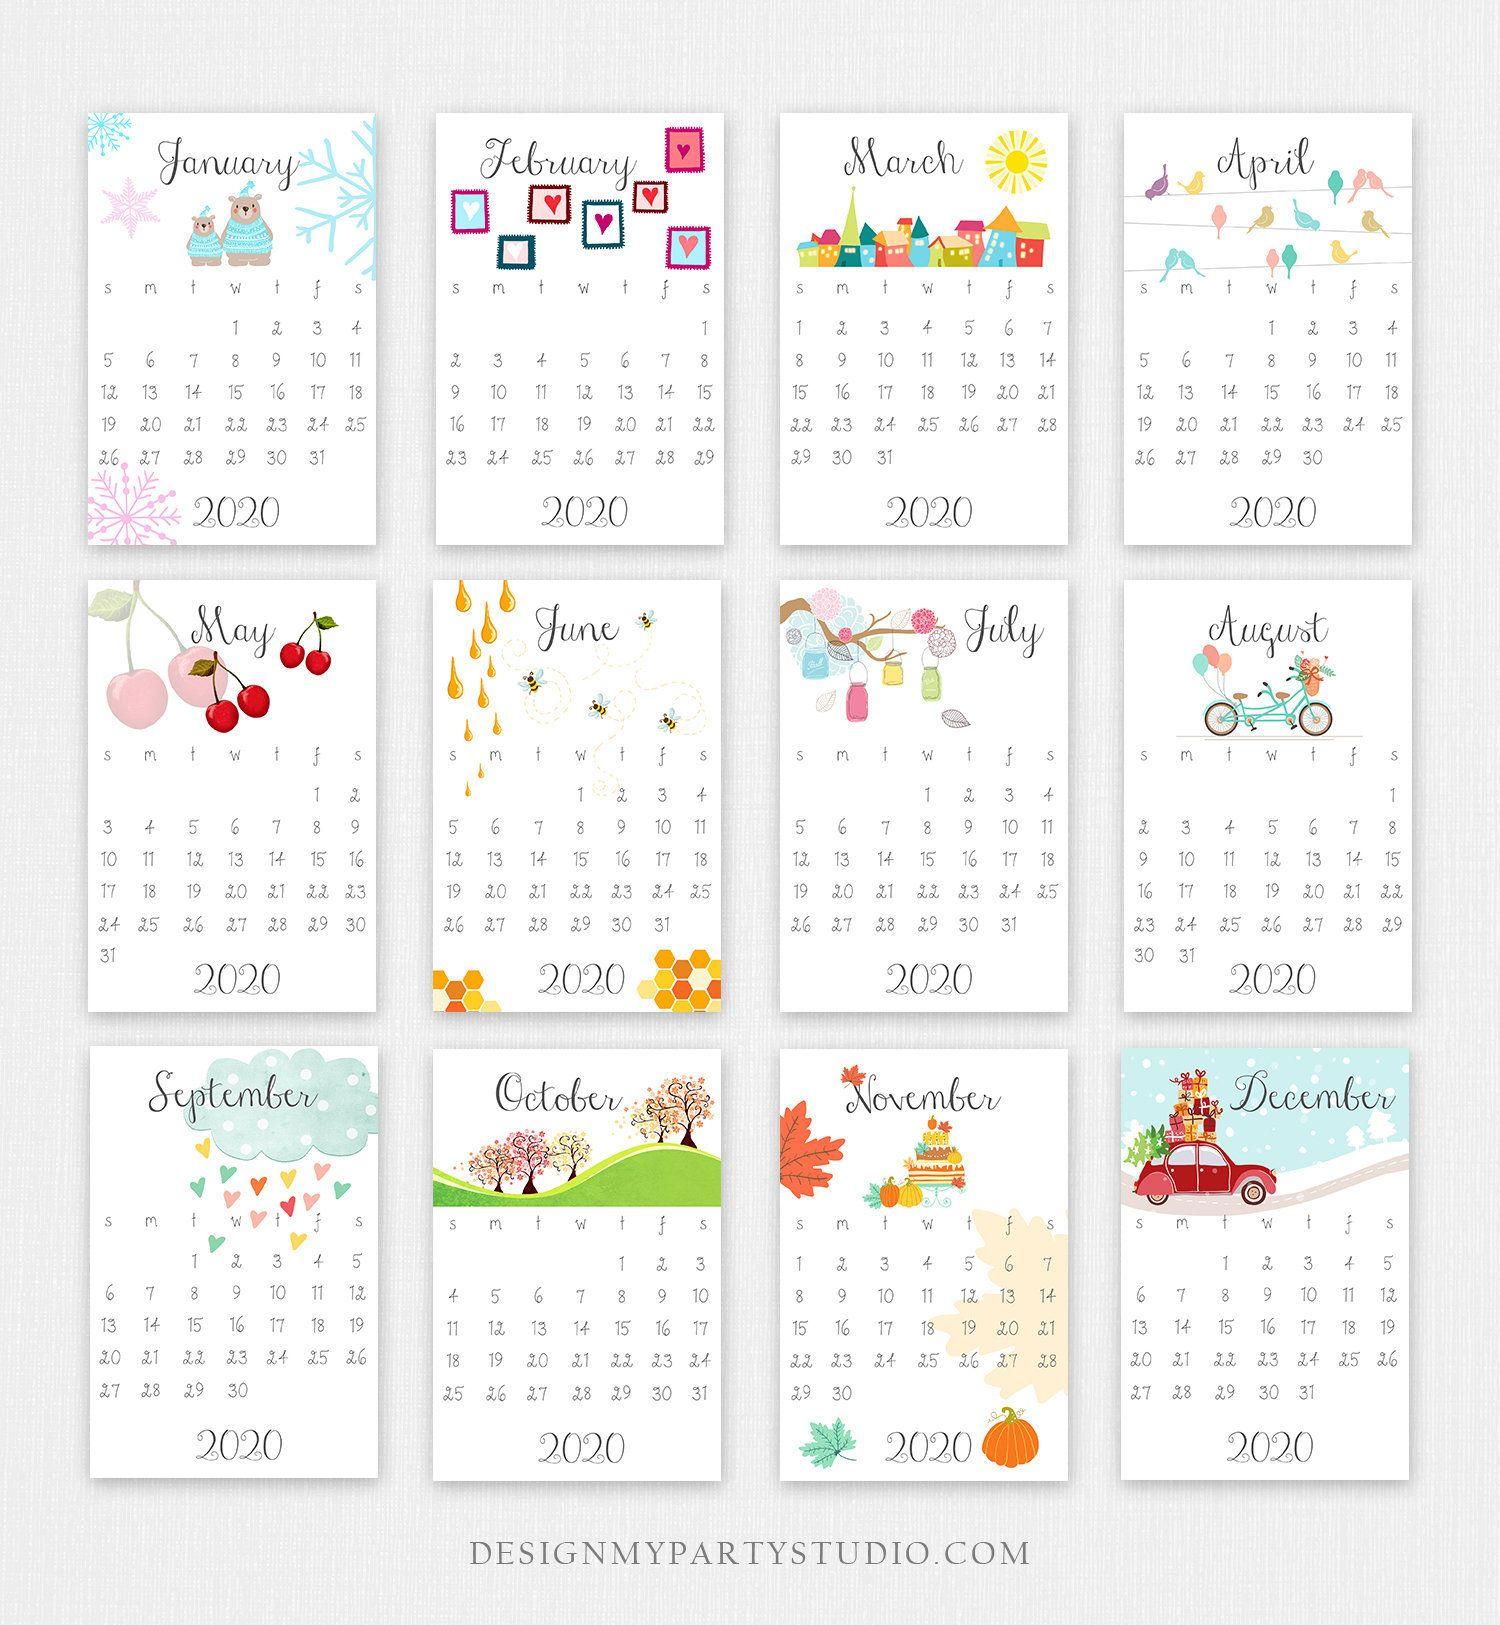 Printable 2020 Calendar Wall Calendar Desk Calendar Classroom